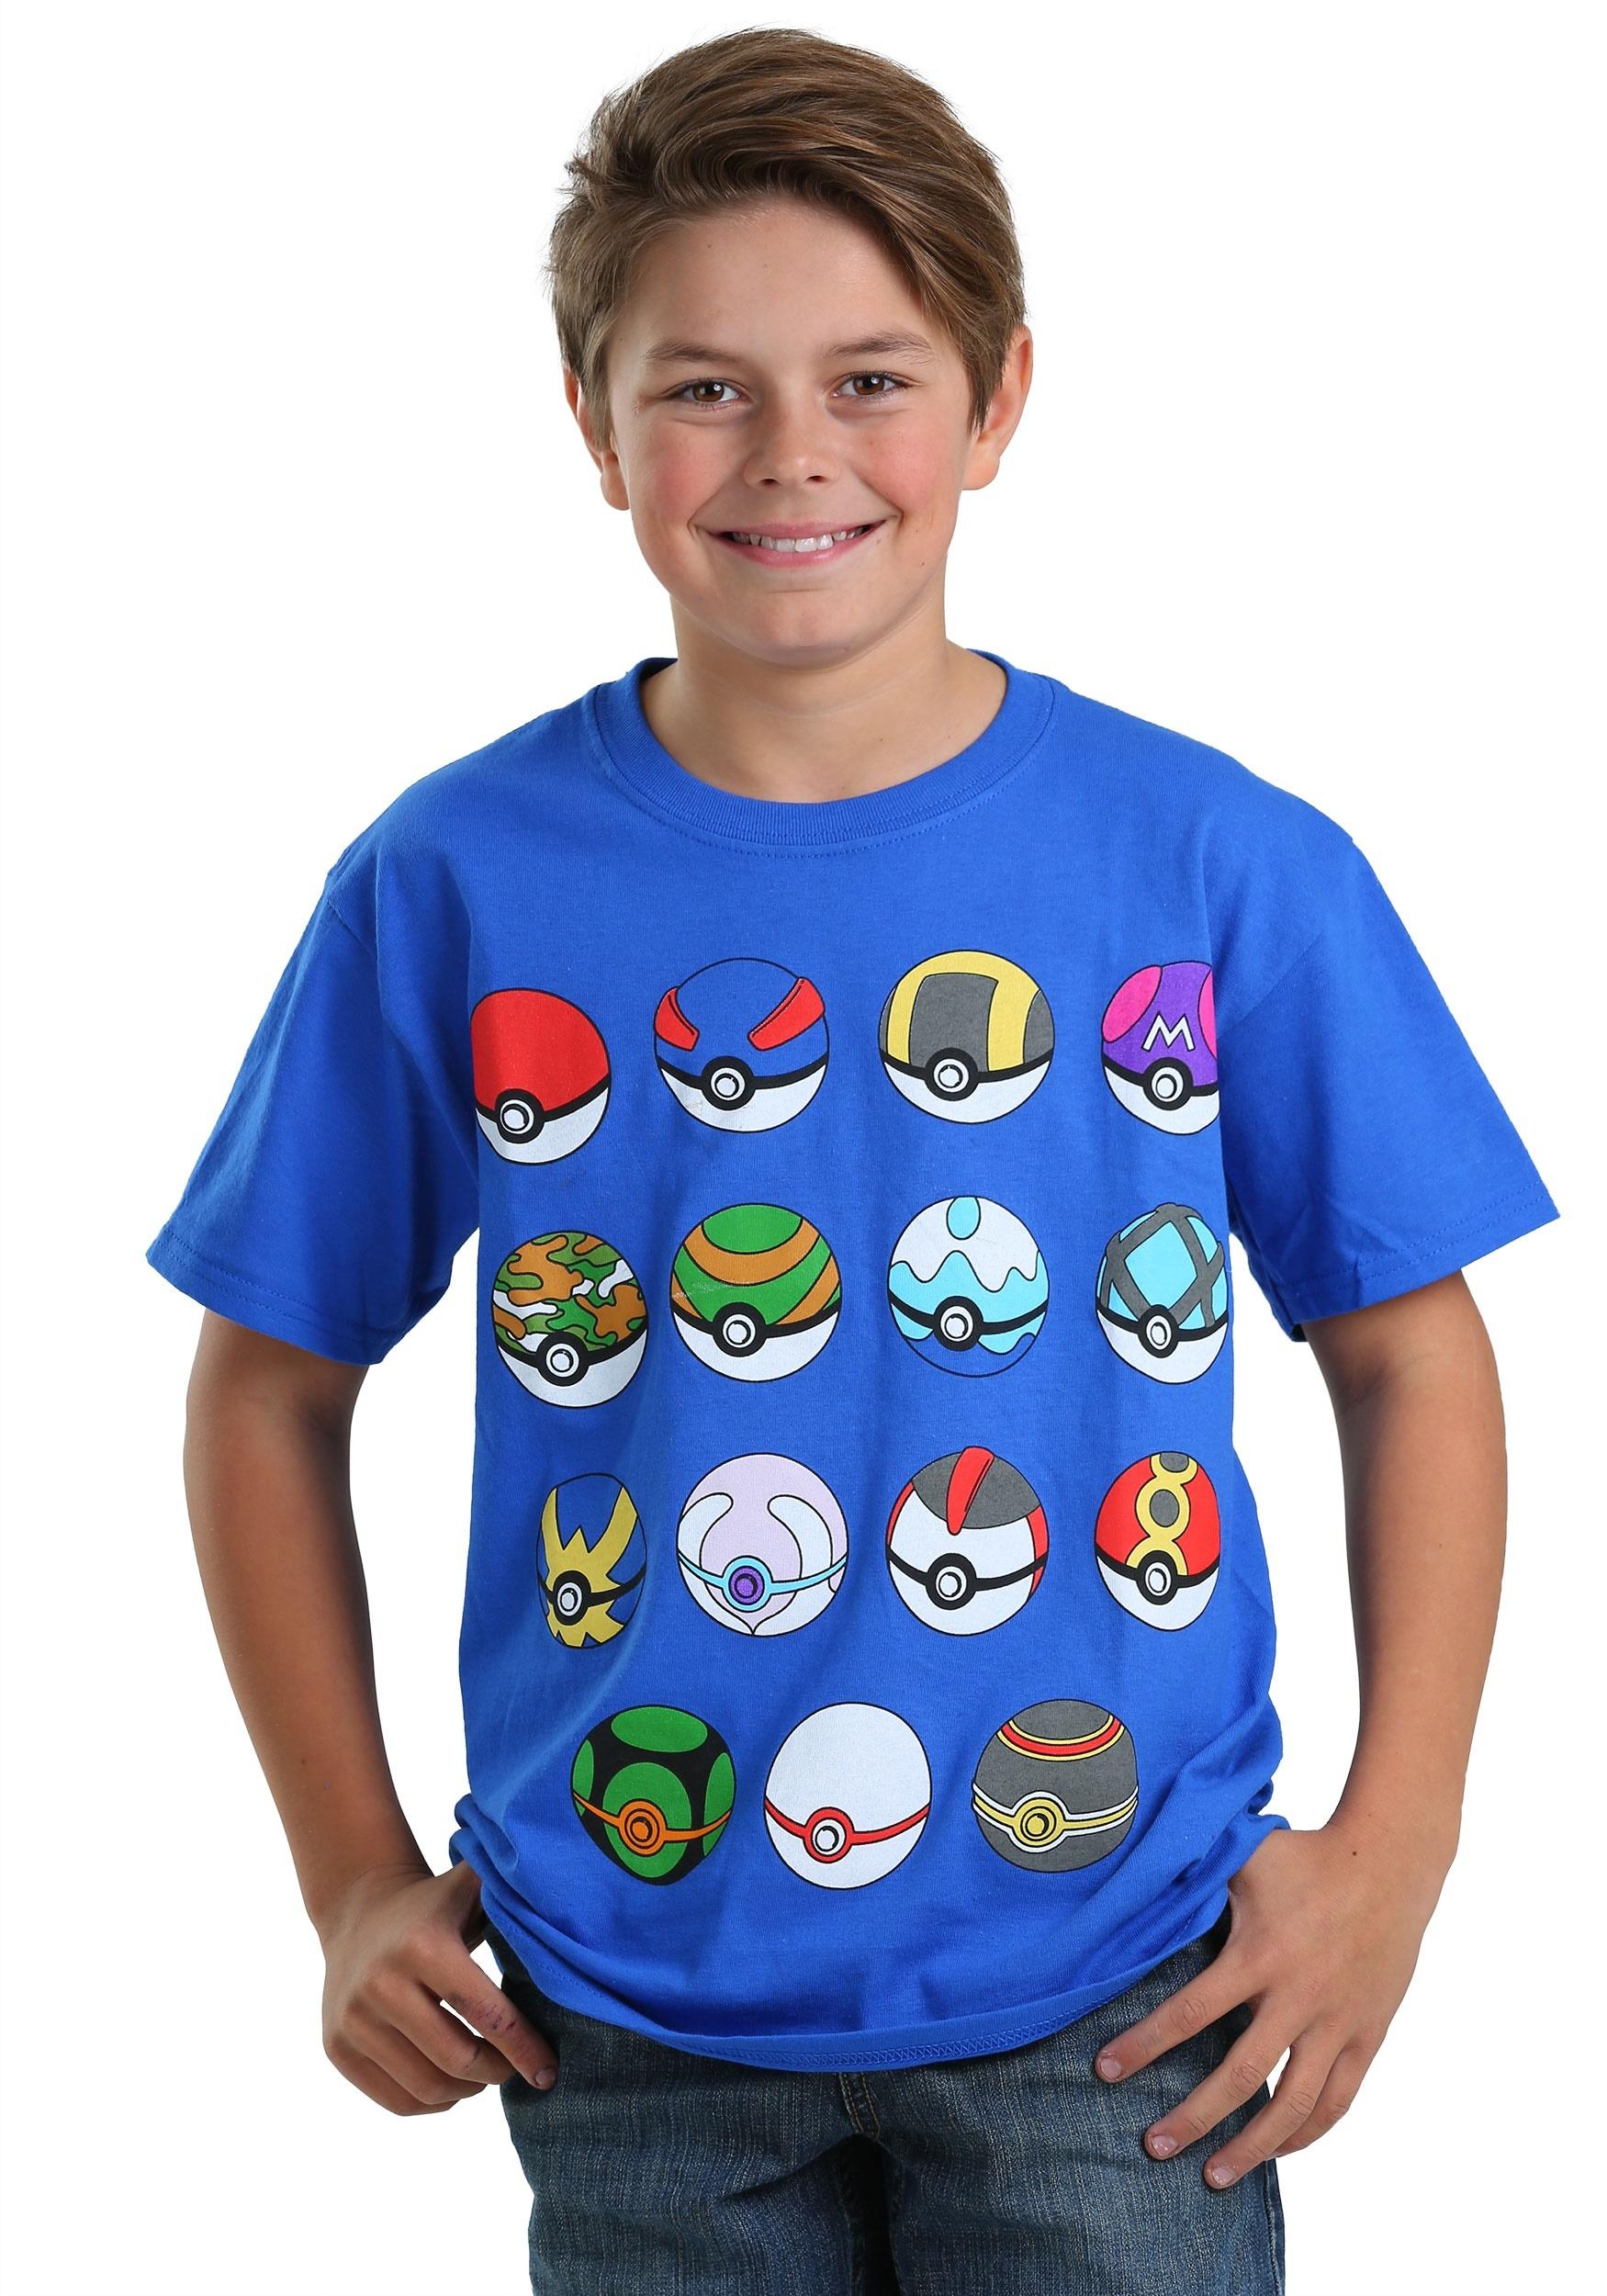 Boys Pokeball Tee From Pokemon